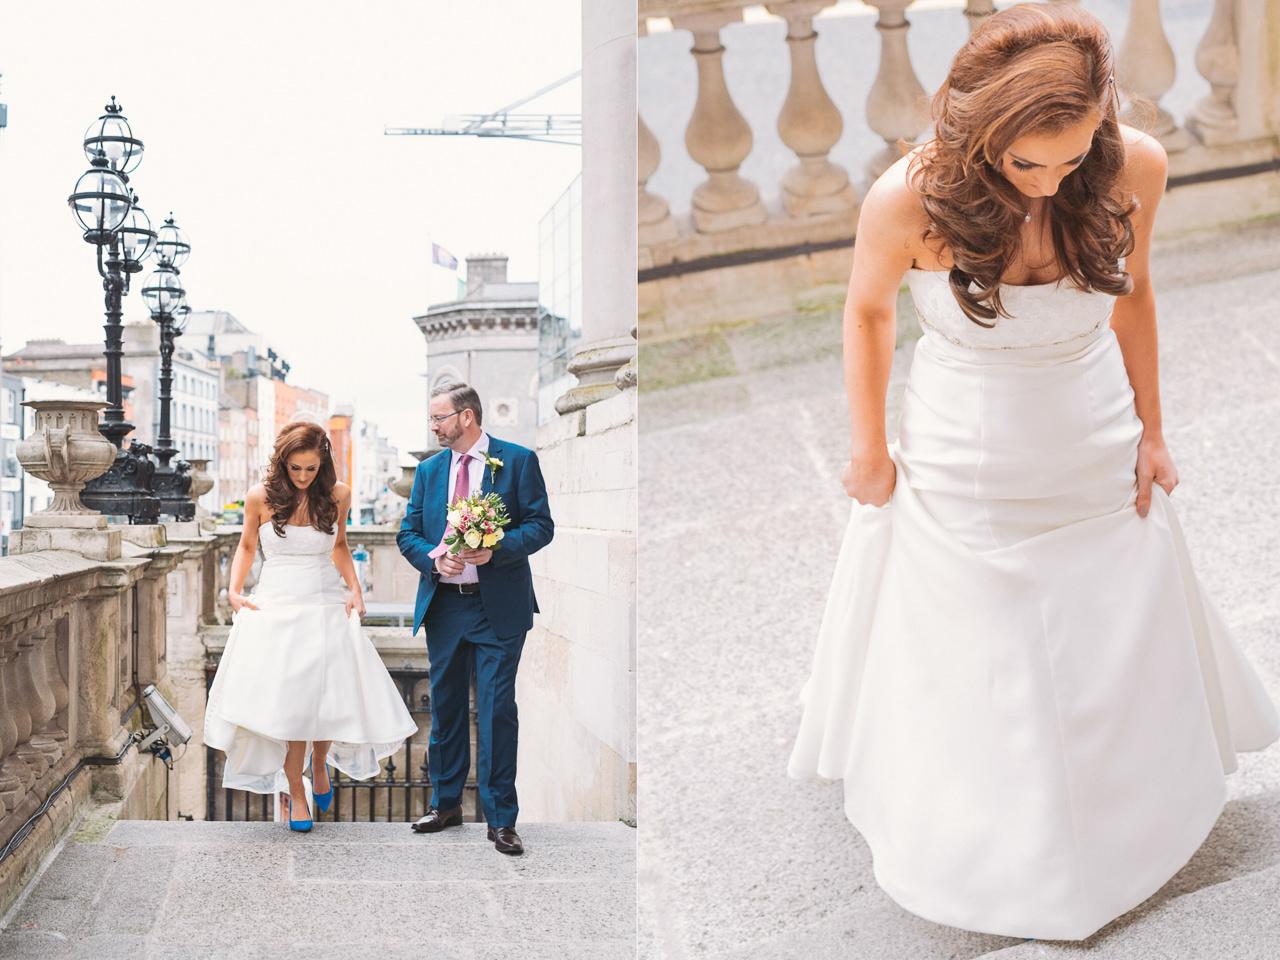 Firechild_Photography_Dublin_Ireland_Wedding_Portrait_Photographer-2